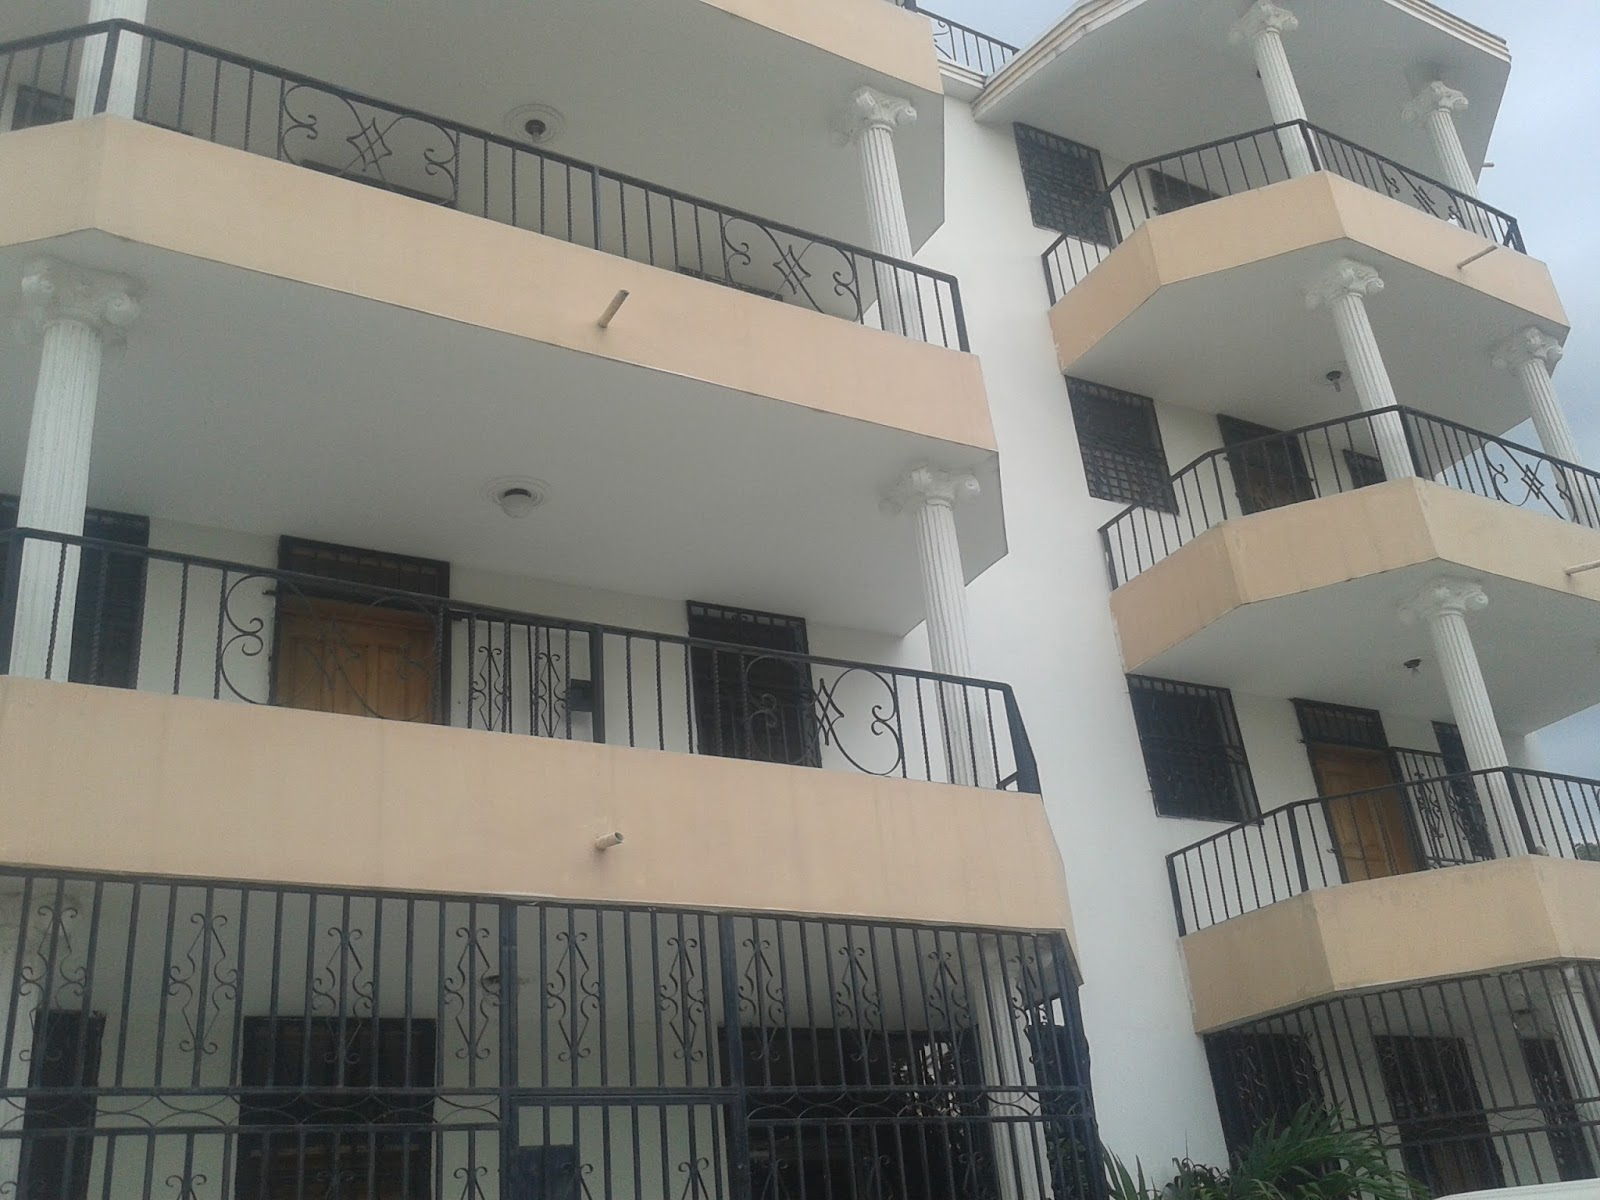 3 appartements meubles a louer a frere46 immobilier en haiti for Meuble casami haiti